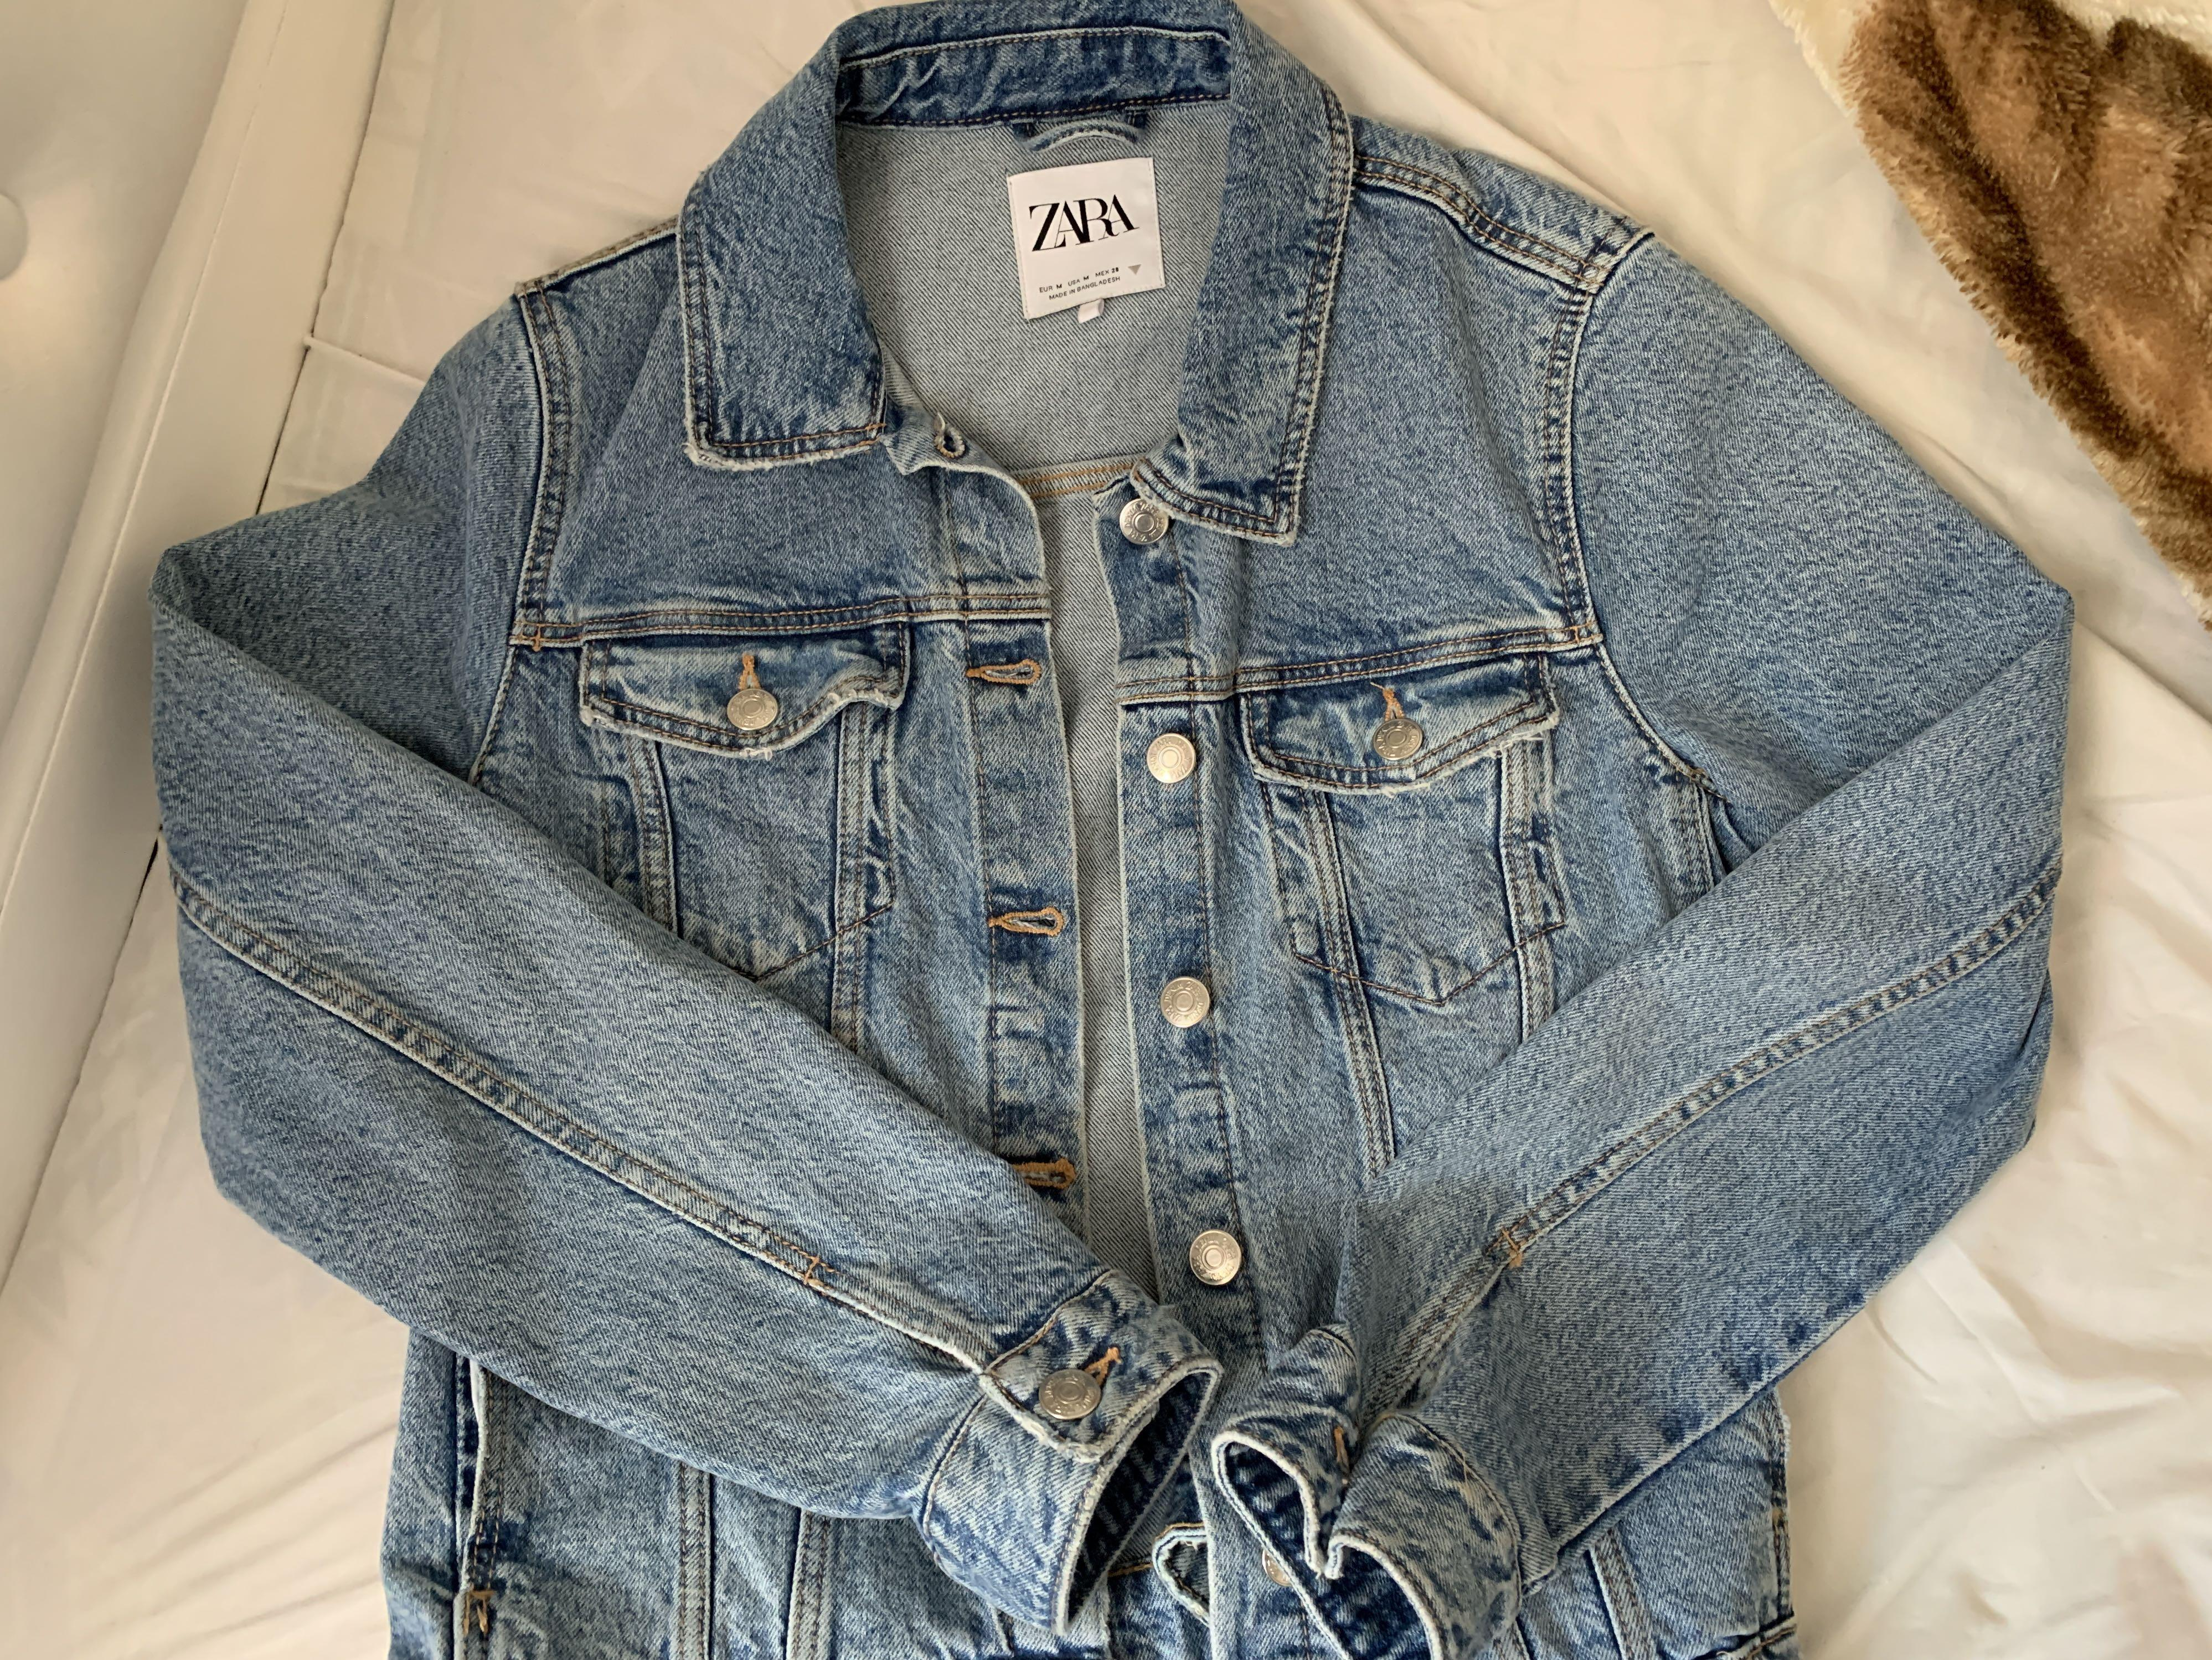 Zara jean jacket size M